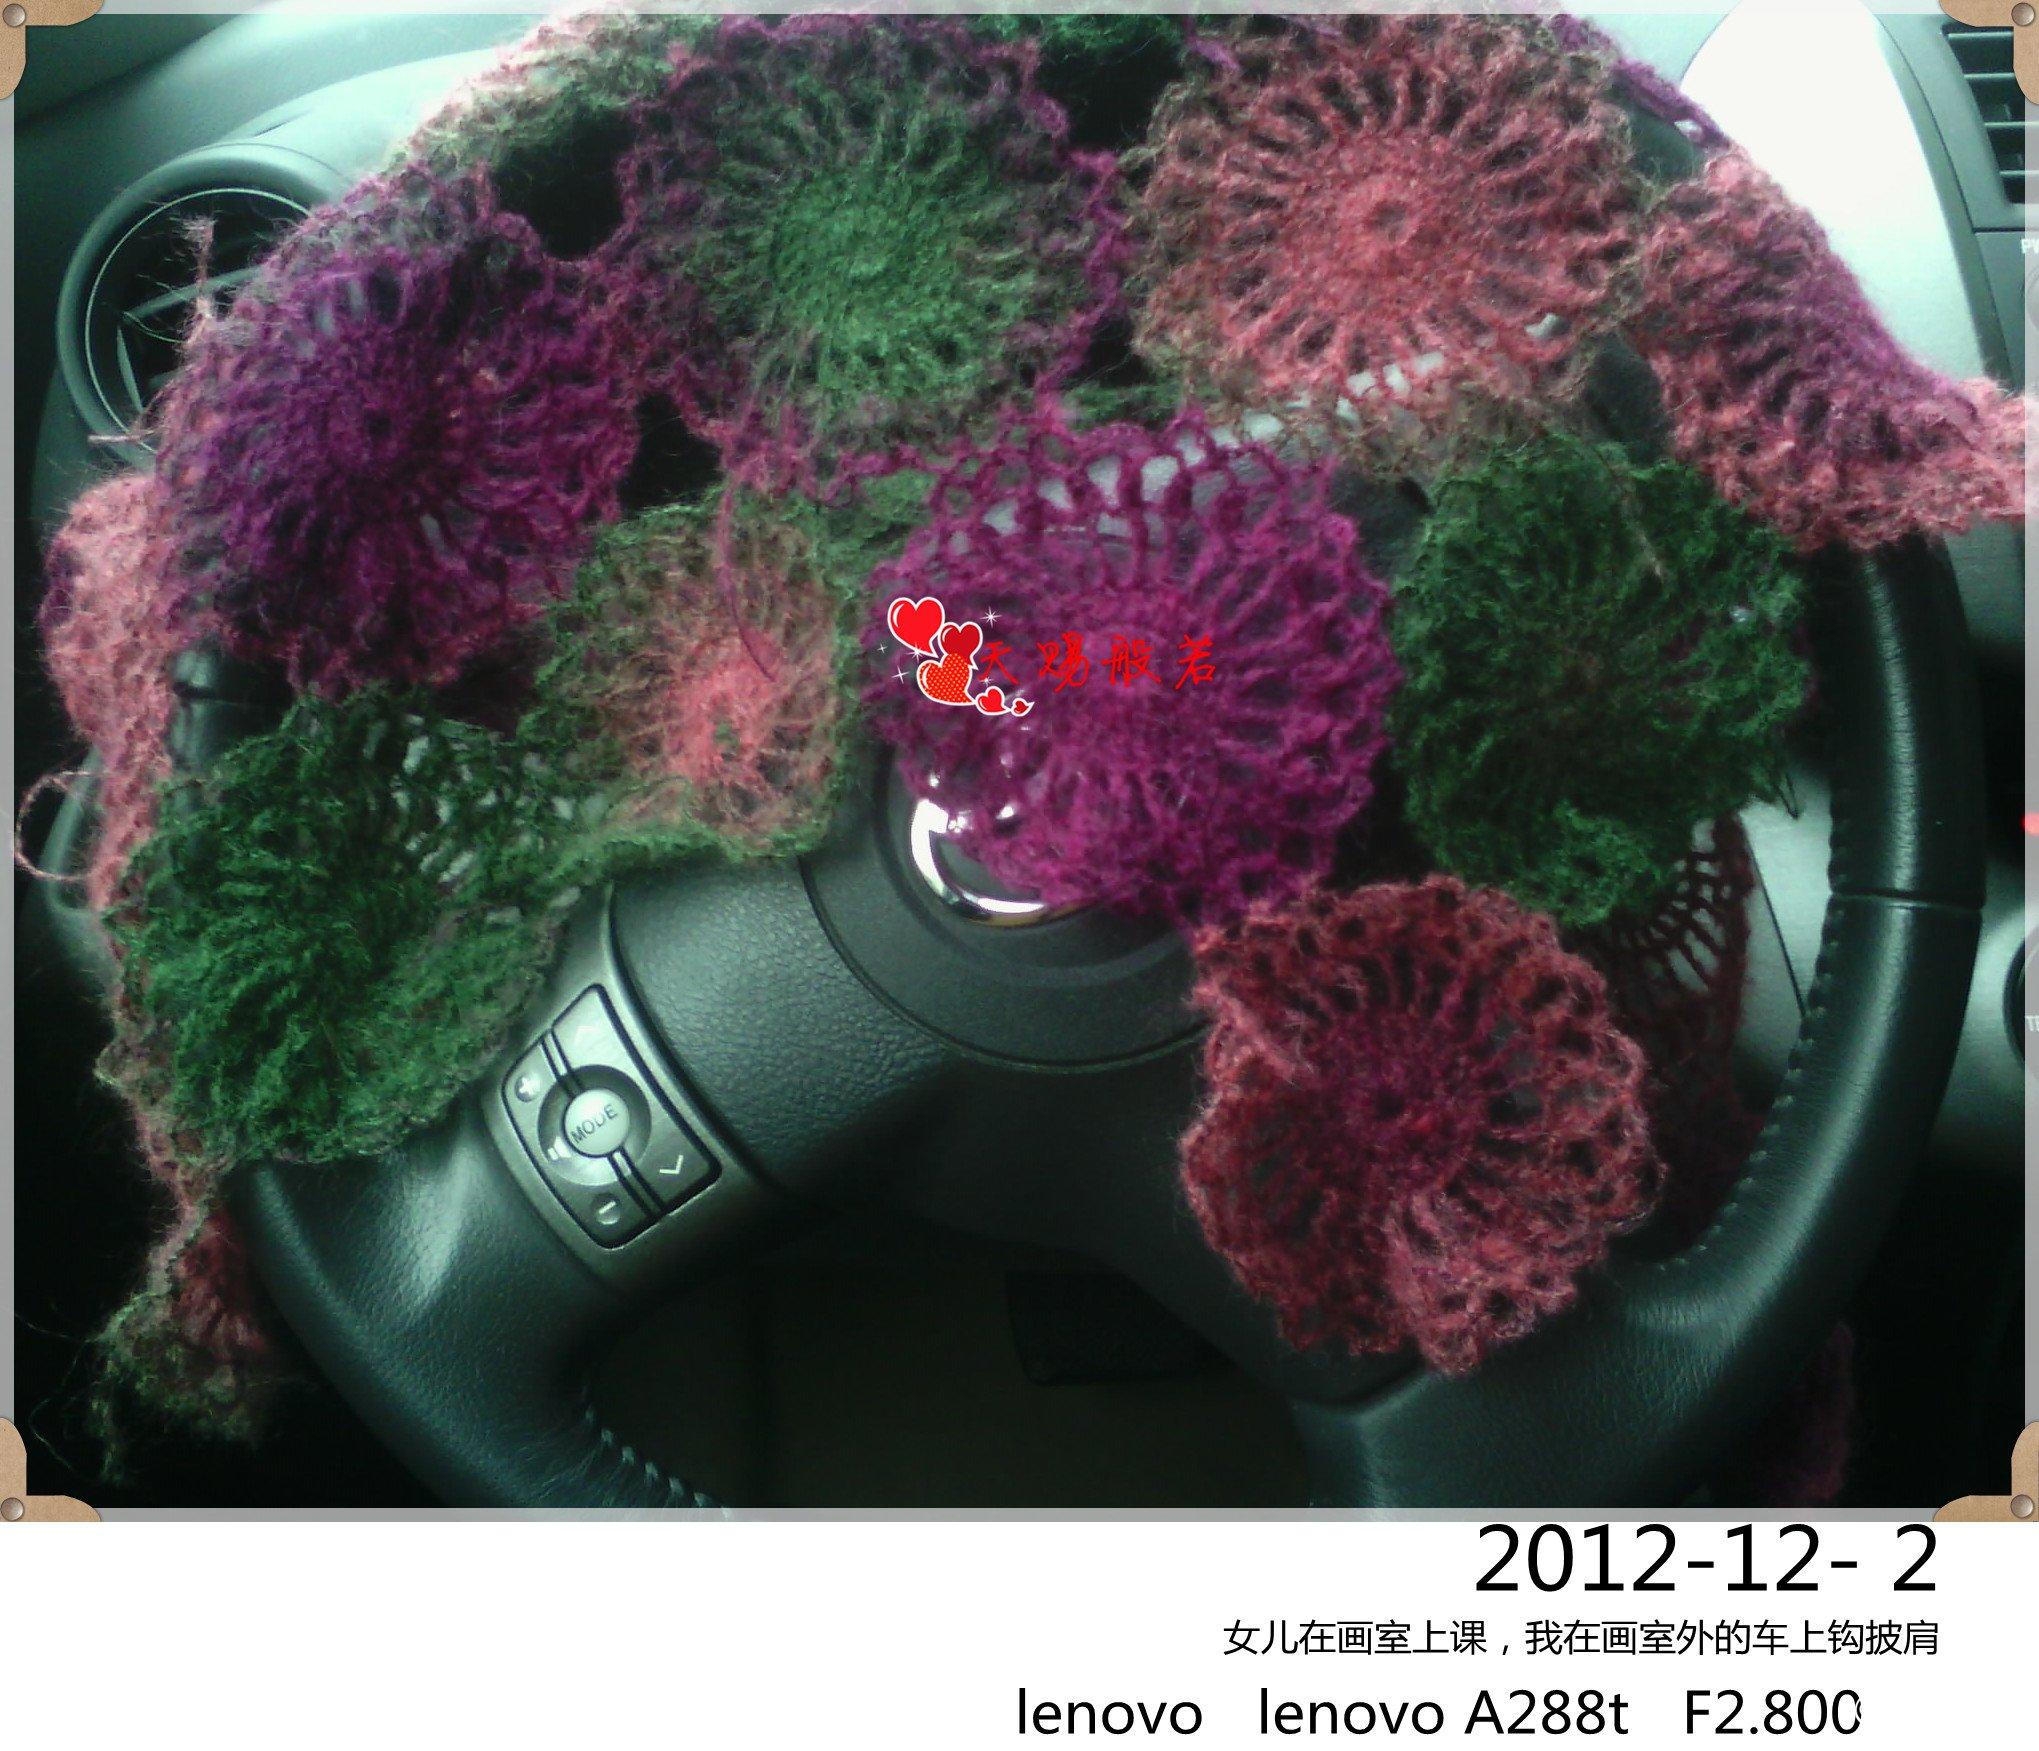 IMG_20121202_112226.jpg